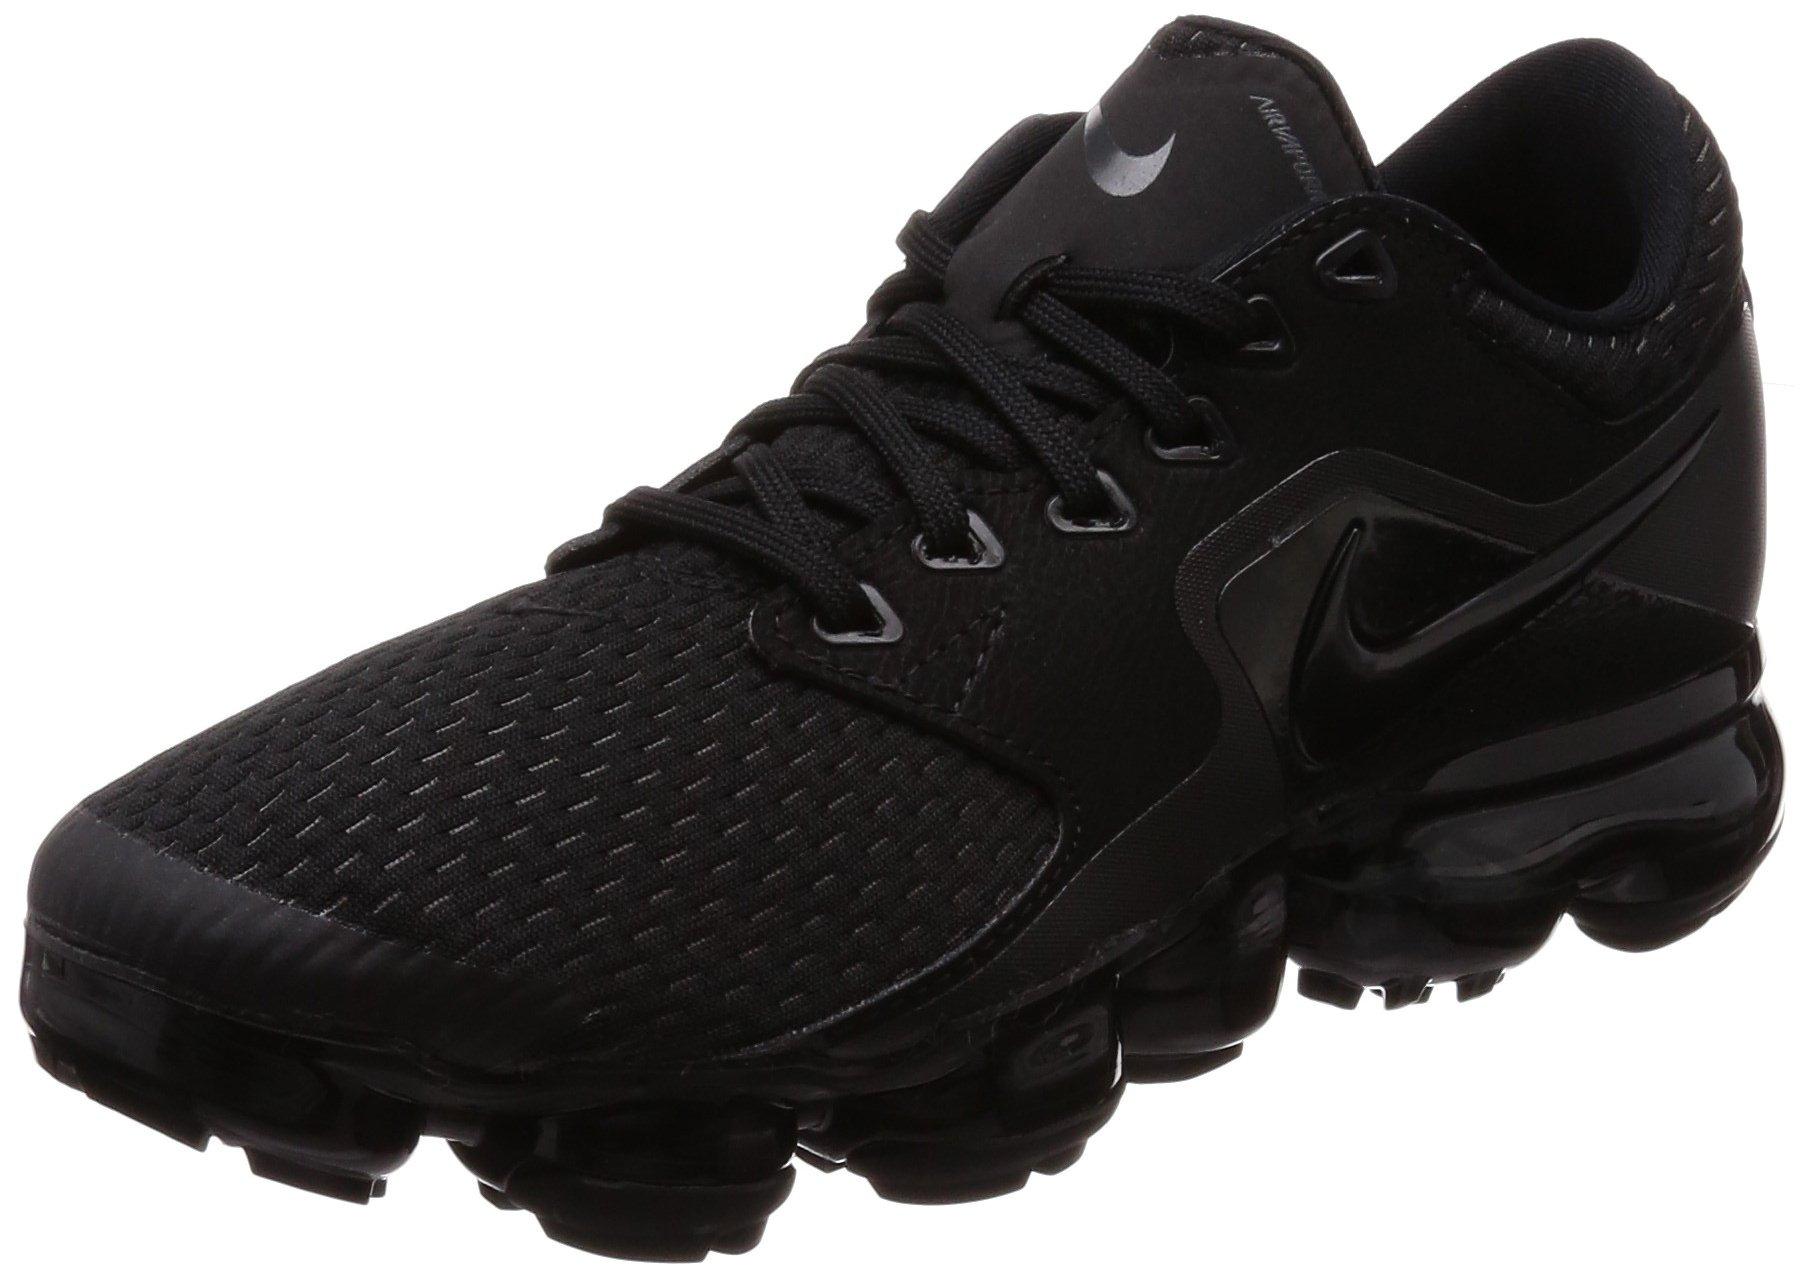 NIKE Women's Air Vapormax Running Shoes (8.5, Black/Black-M)